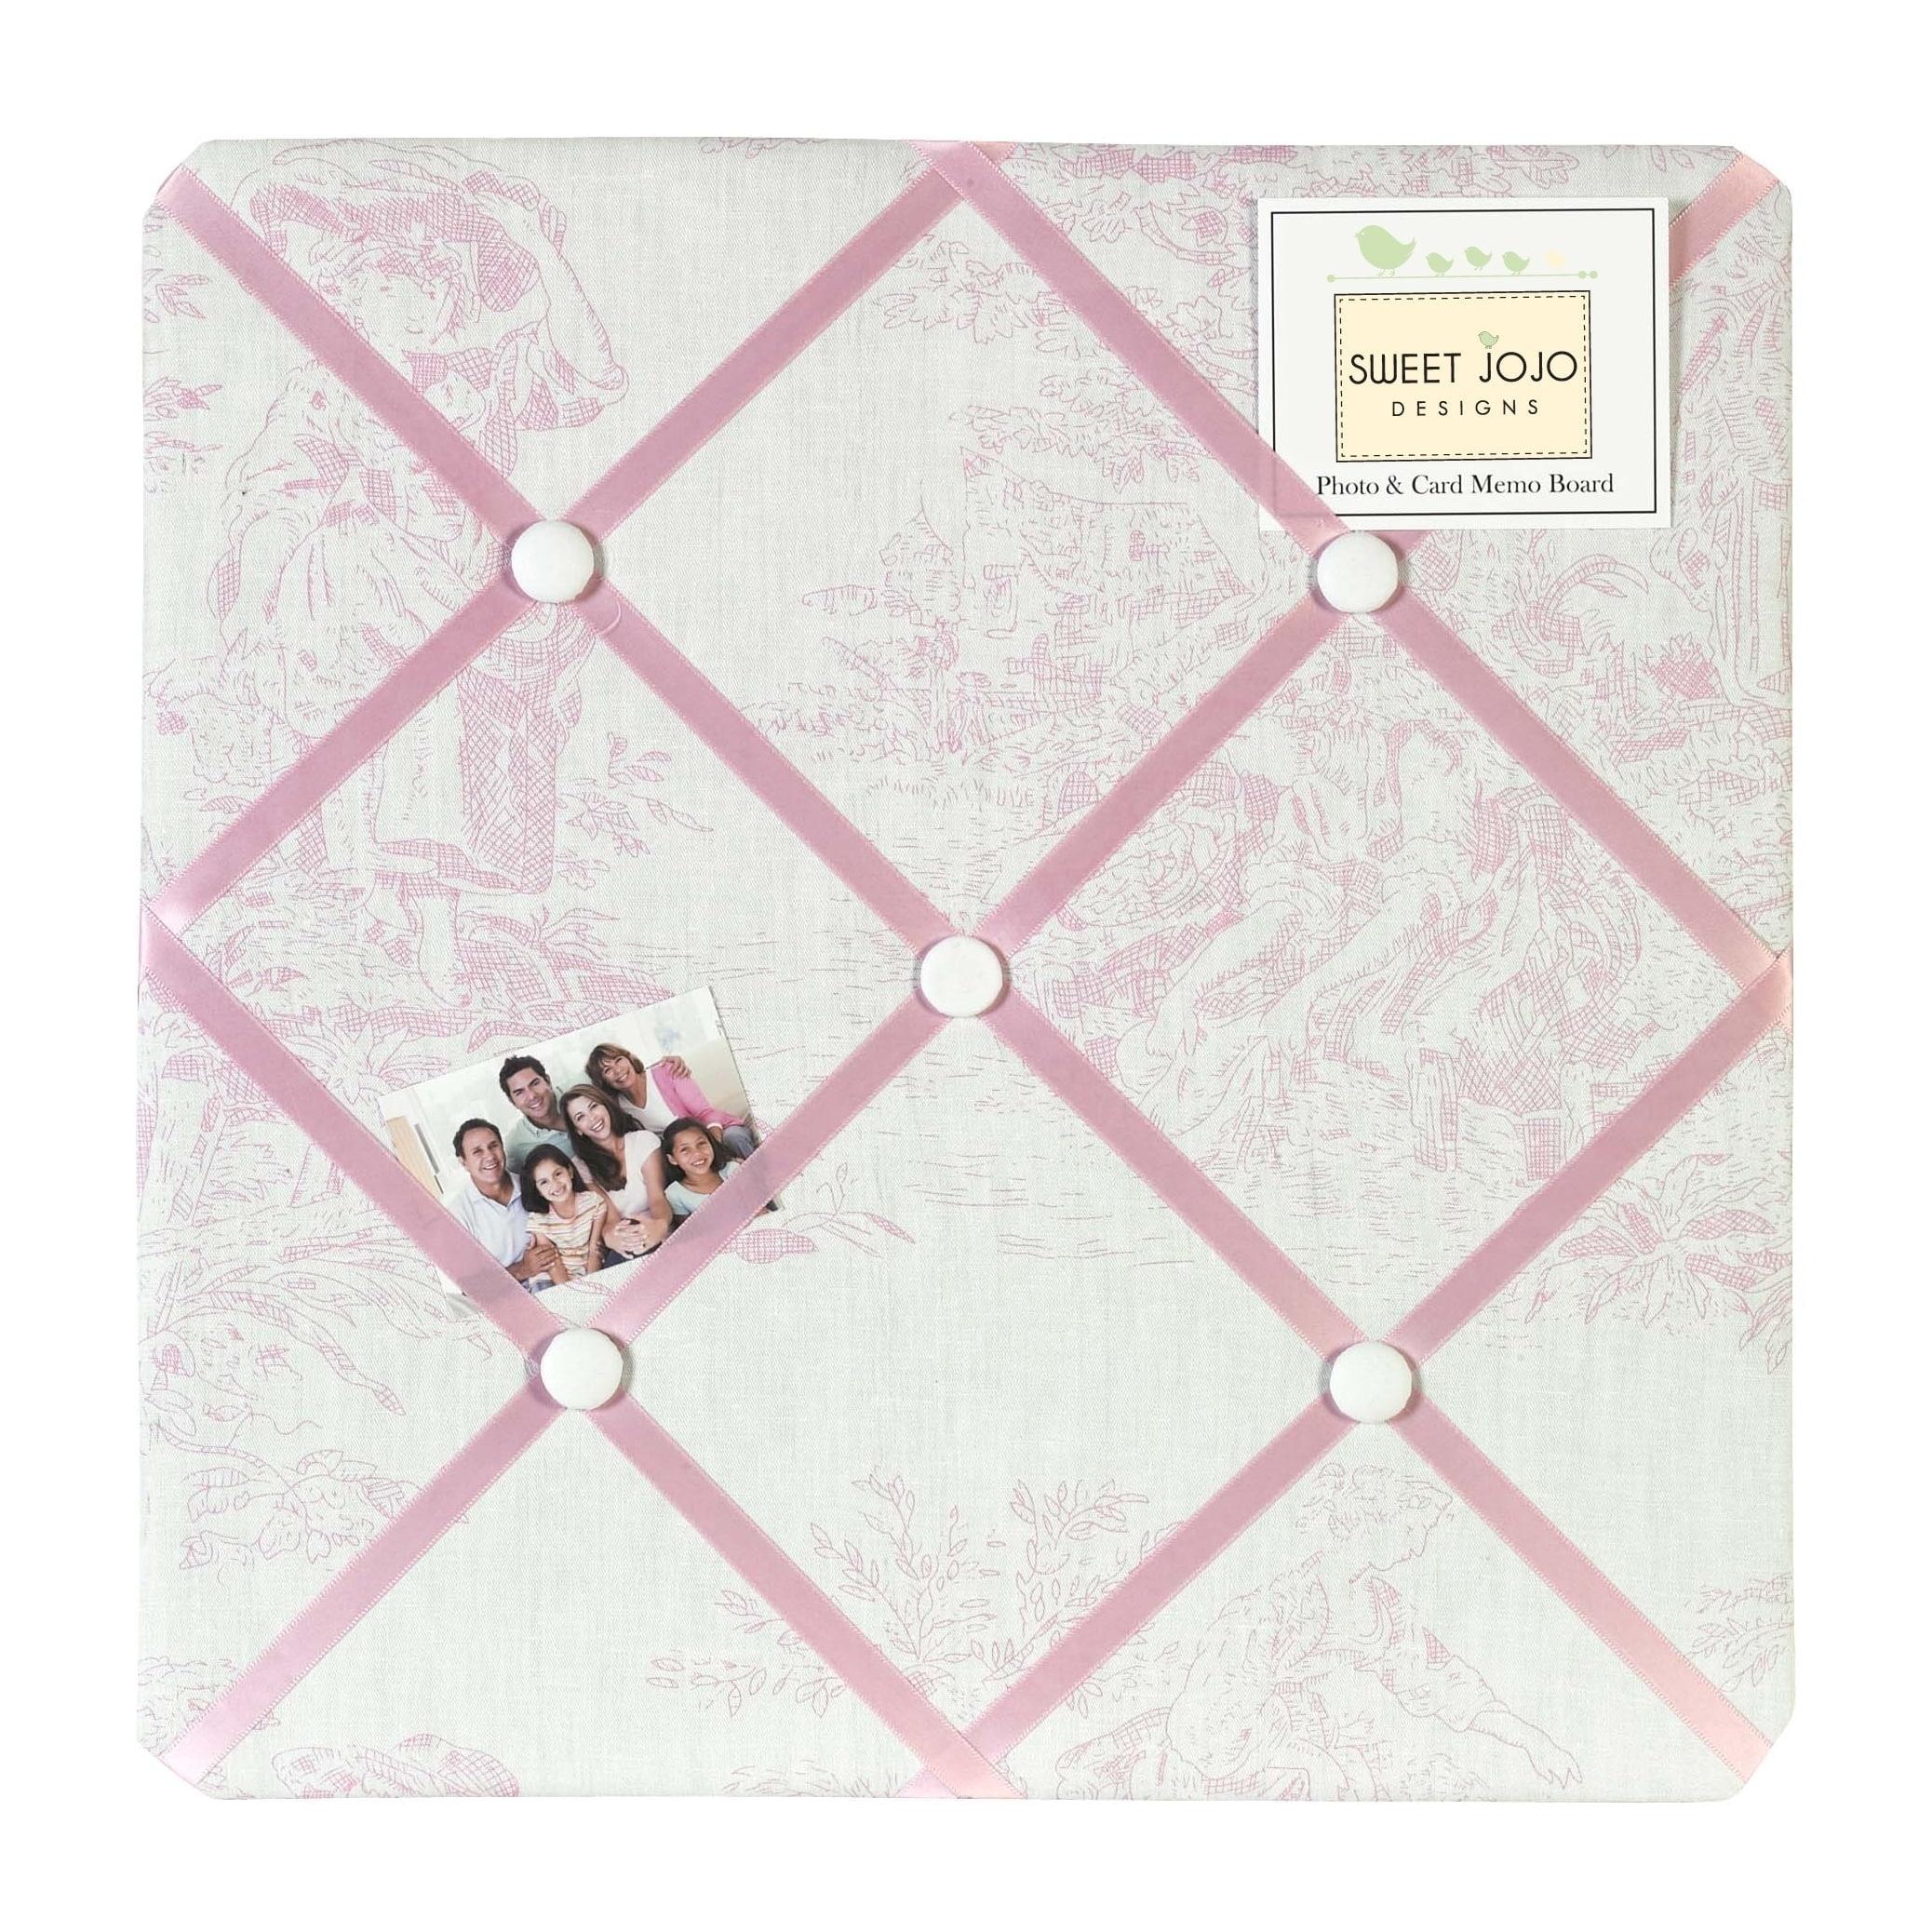 Sweet Jojo Designs Pink French Toile Bulletin Board Overstock 7600295